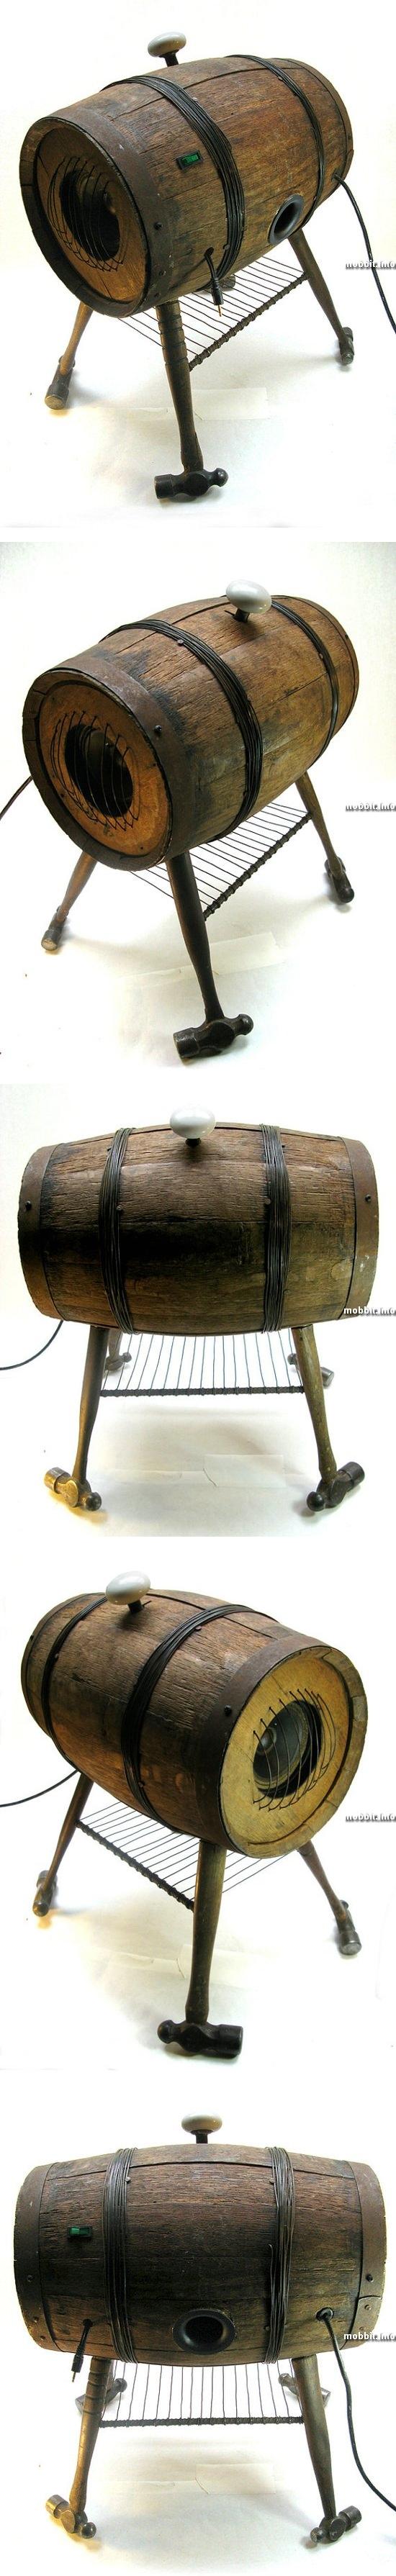 Brandy Keg